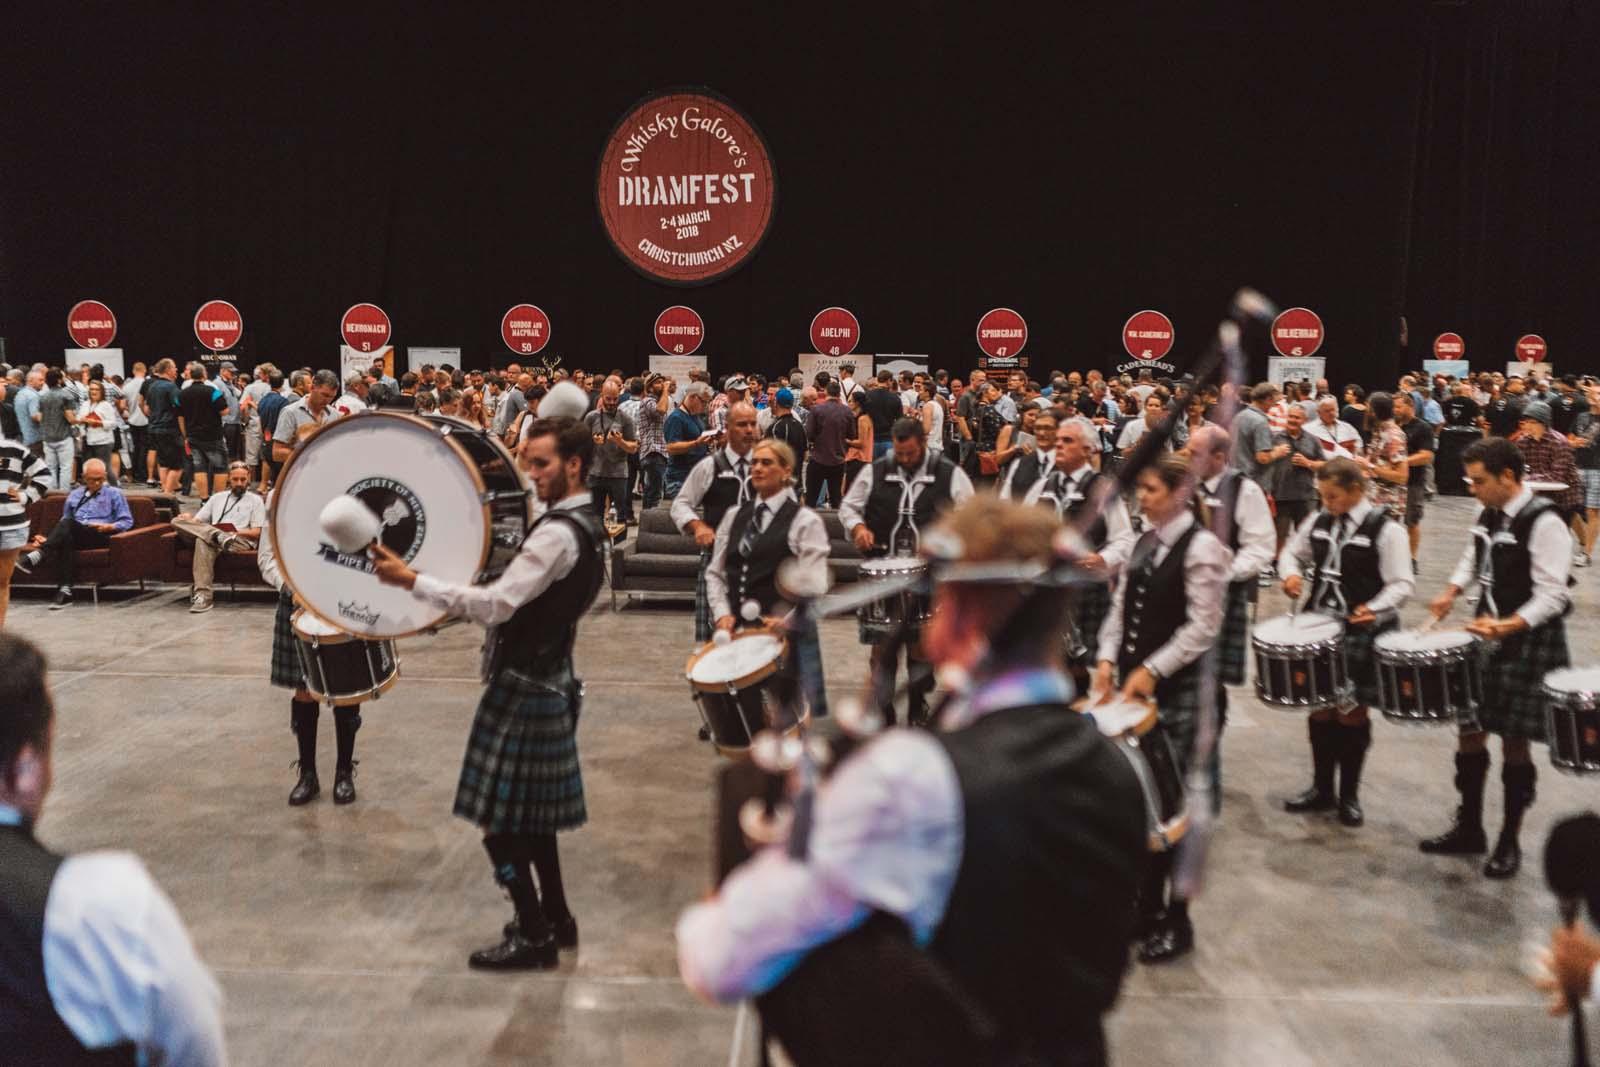 Dramfest 2018 for Whisky Galore-402.jpg